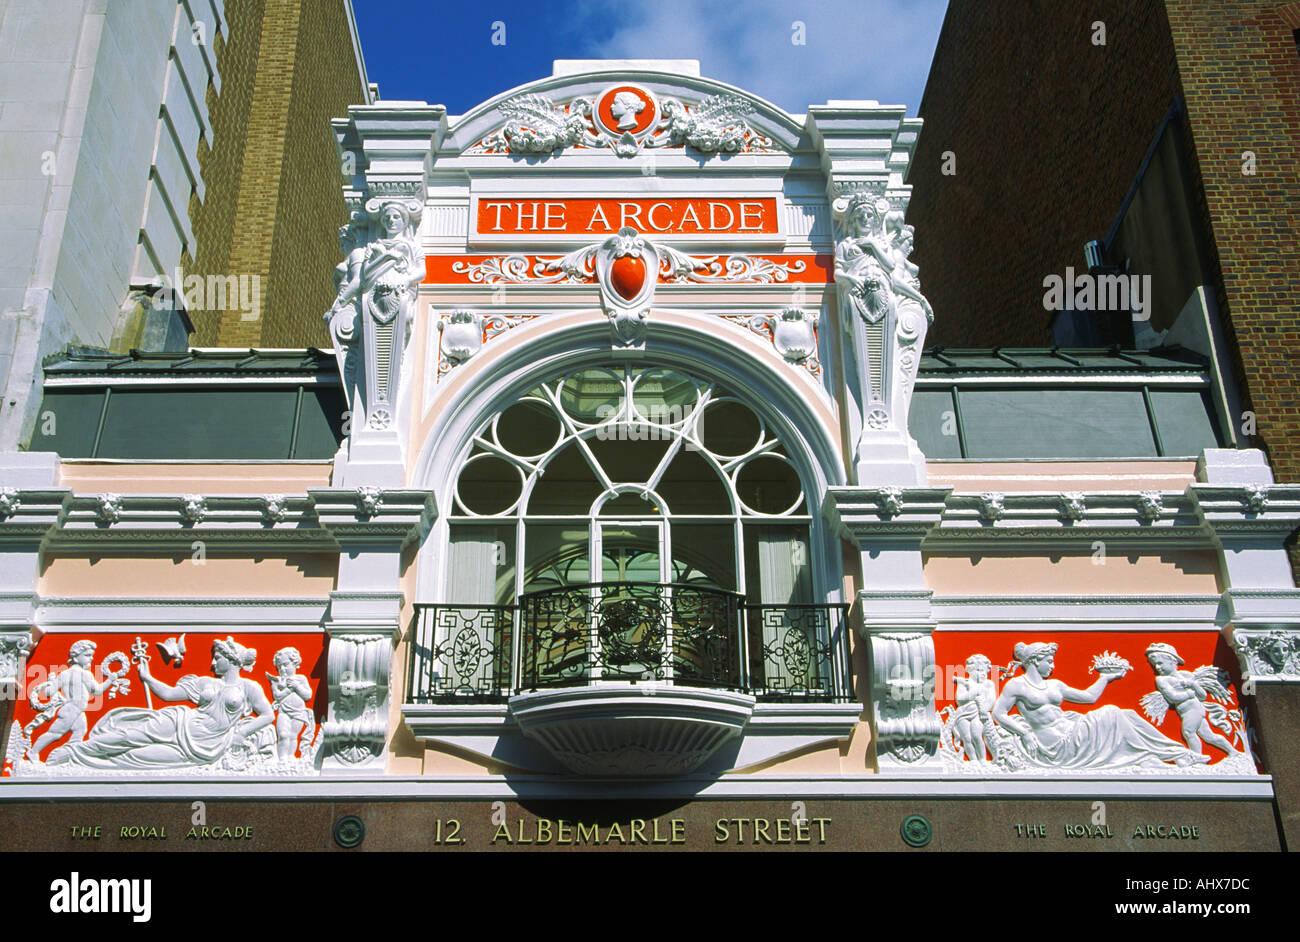 Facade of The Royal Arcade Albermarle Street London England - Stock Image